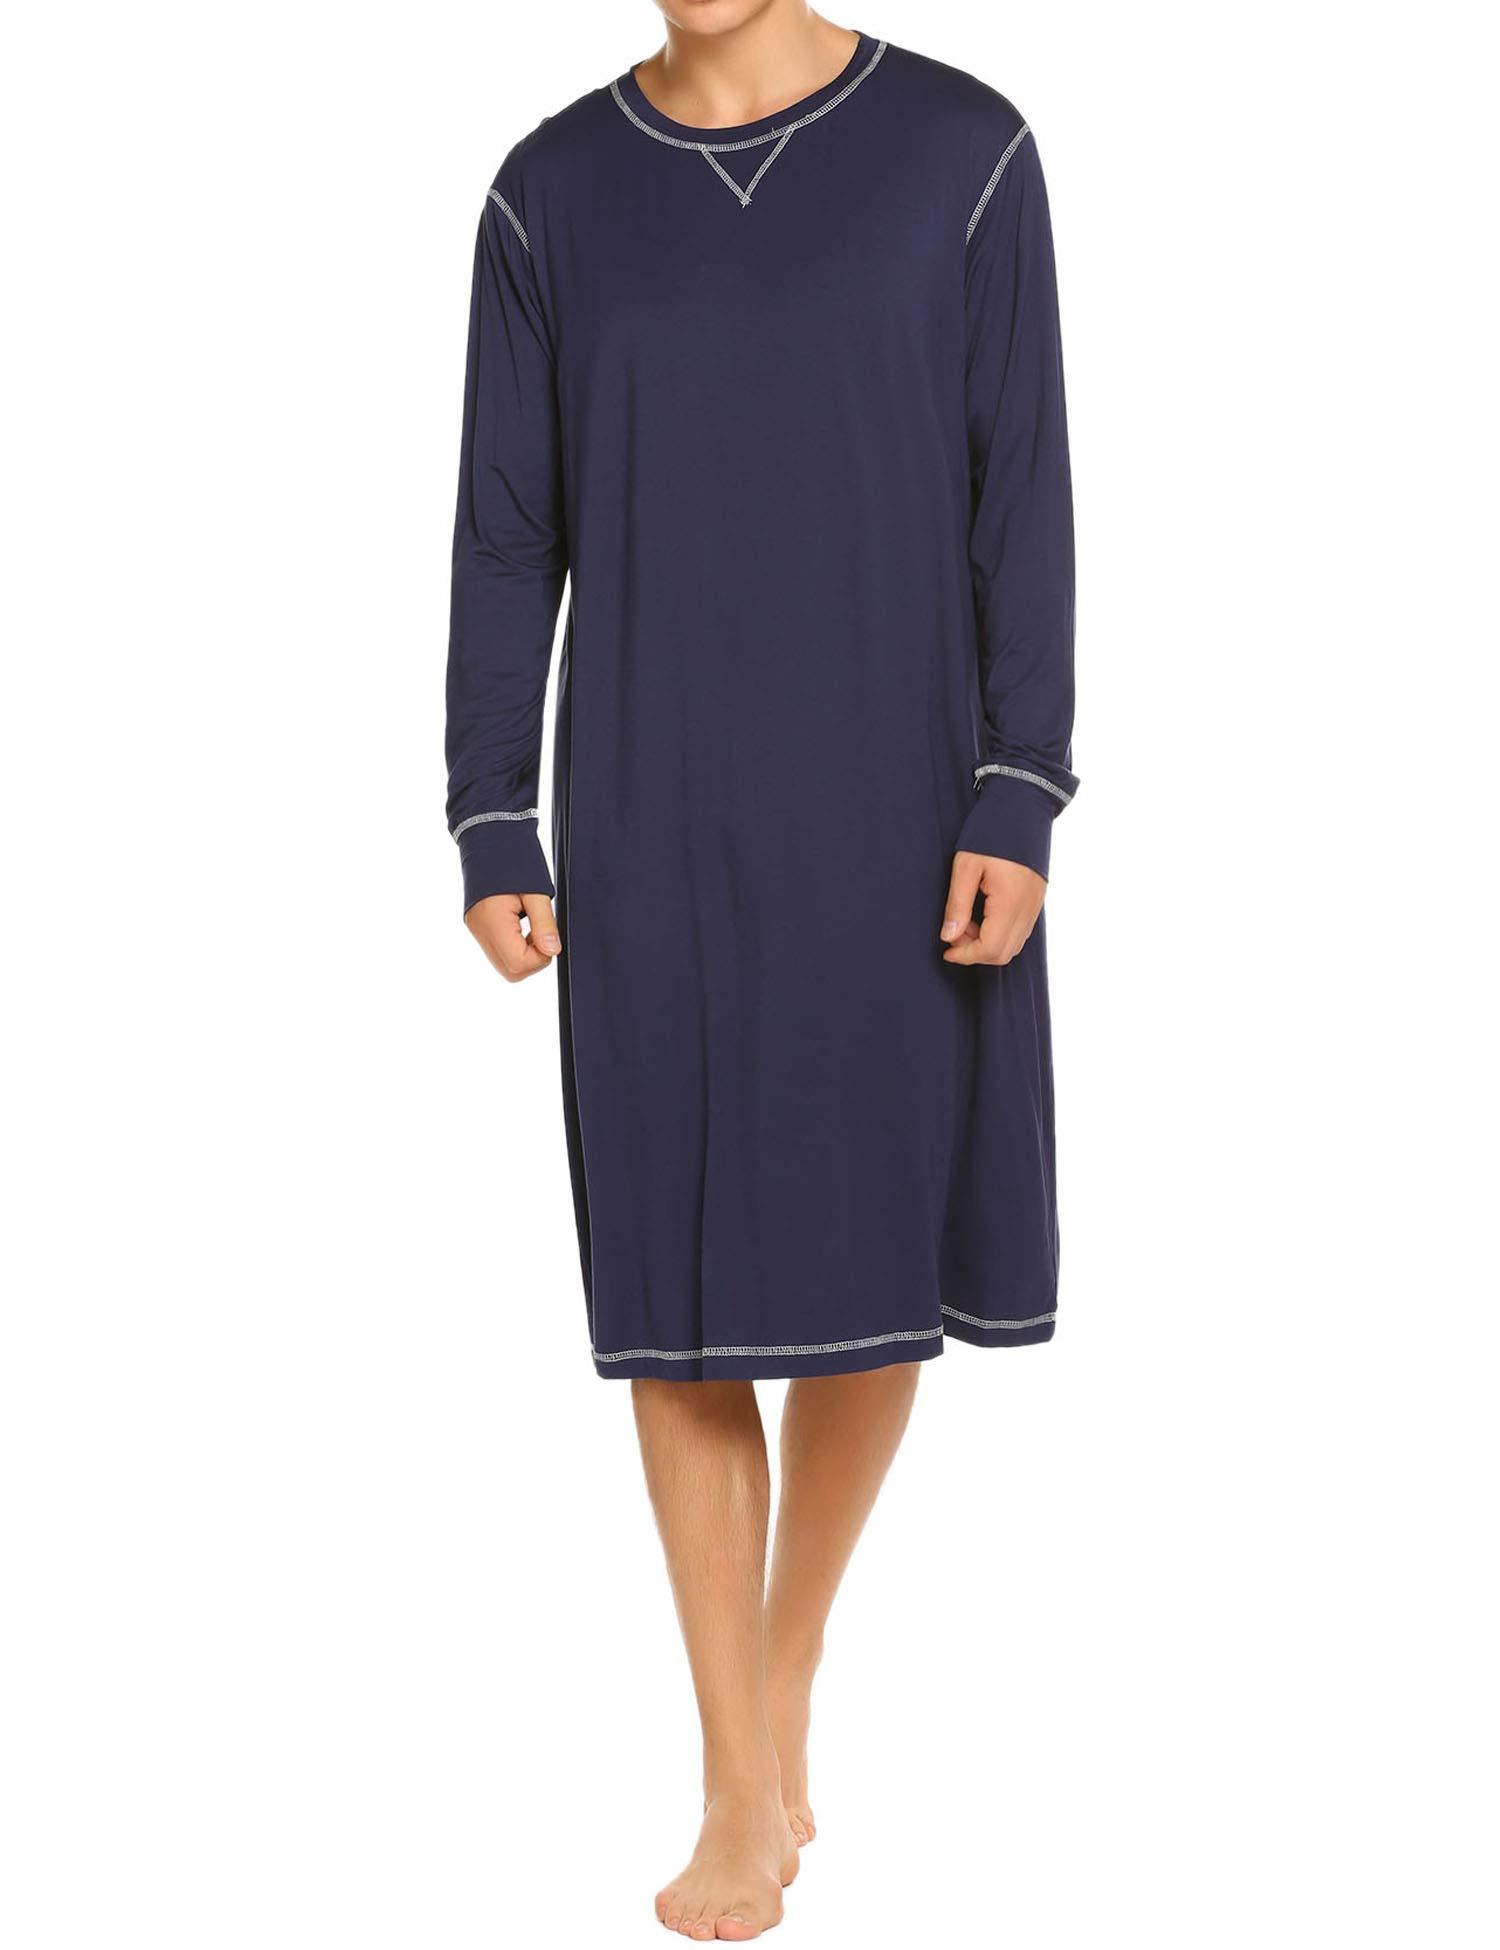 Ekouaer Sleepwear Mens Long Sleeve Nightshirt Long Nightgown Soft Pajamas Sleep Shirt ,Navy,X-Large